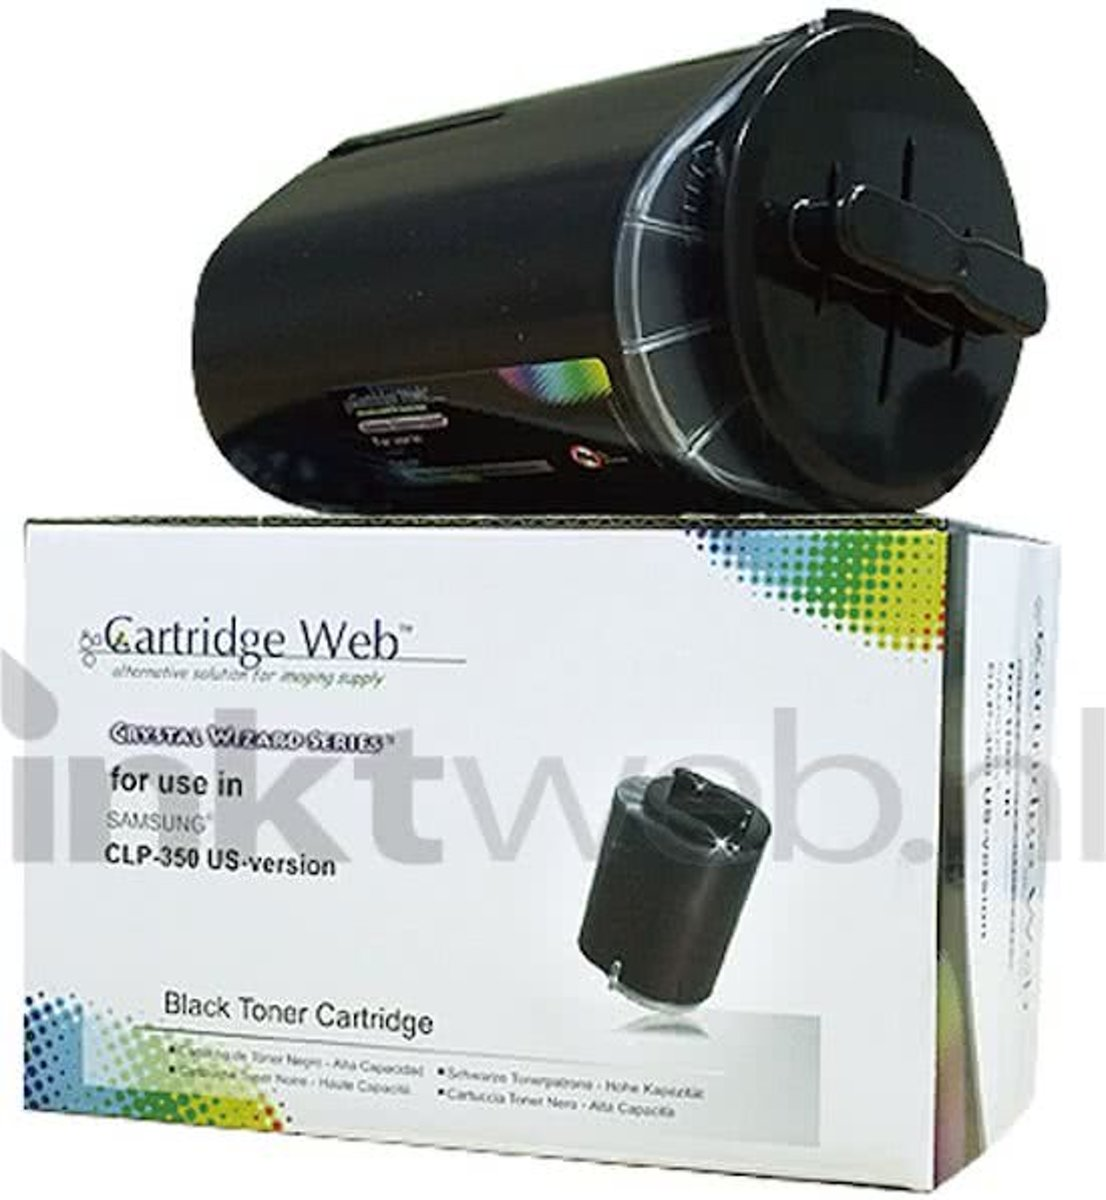 zu K4092 für HP SAMSUNG CLX-3175 3x Toner BLACK komp